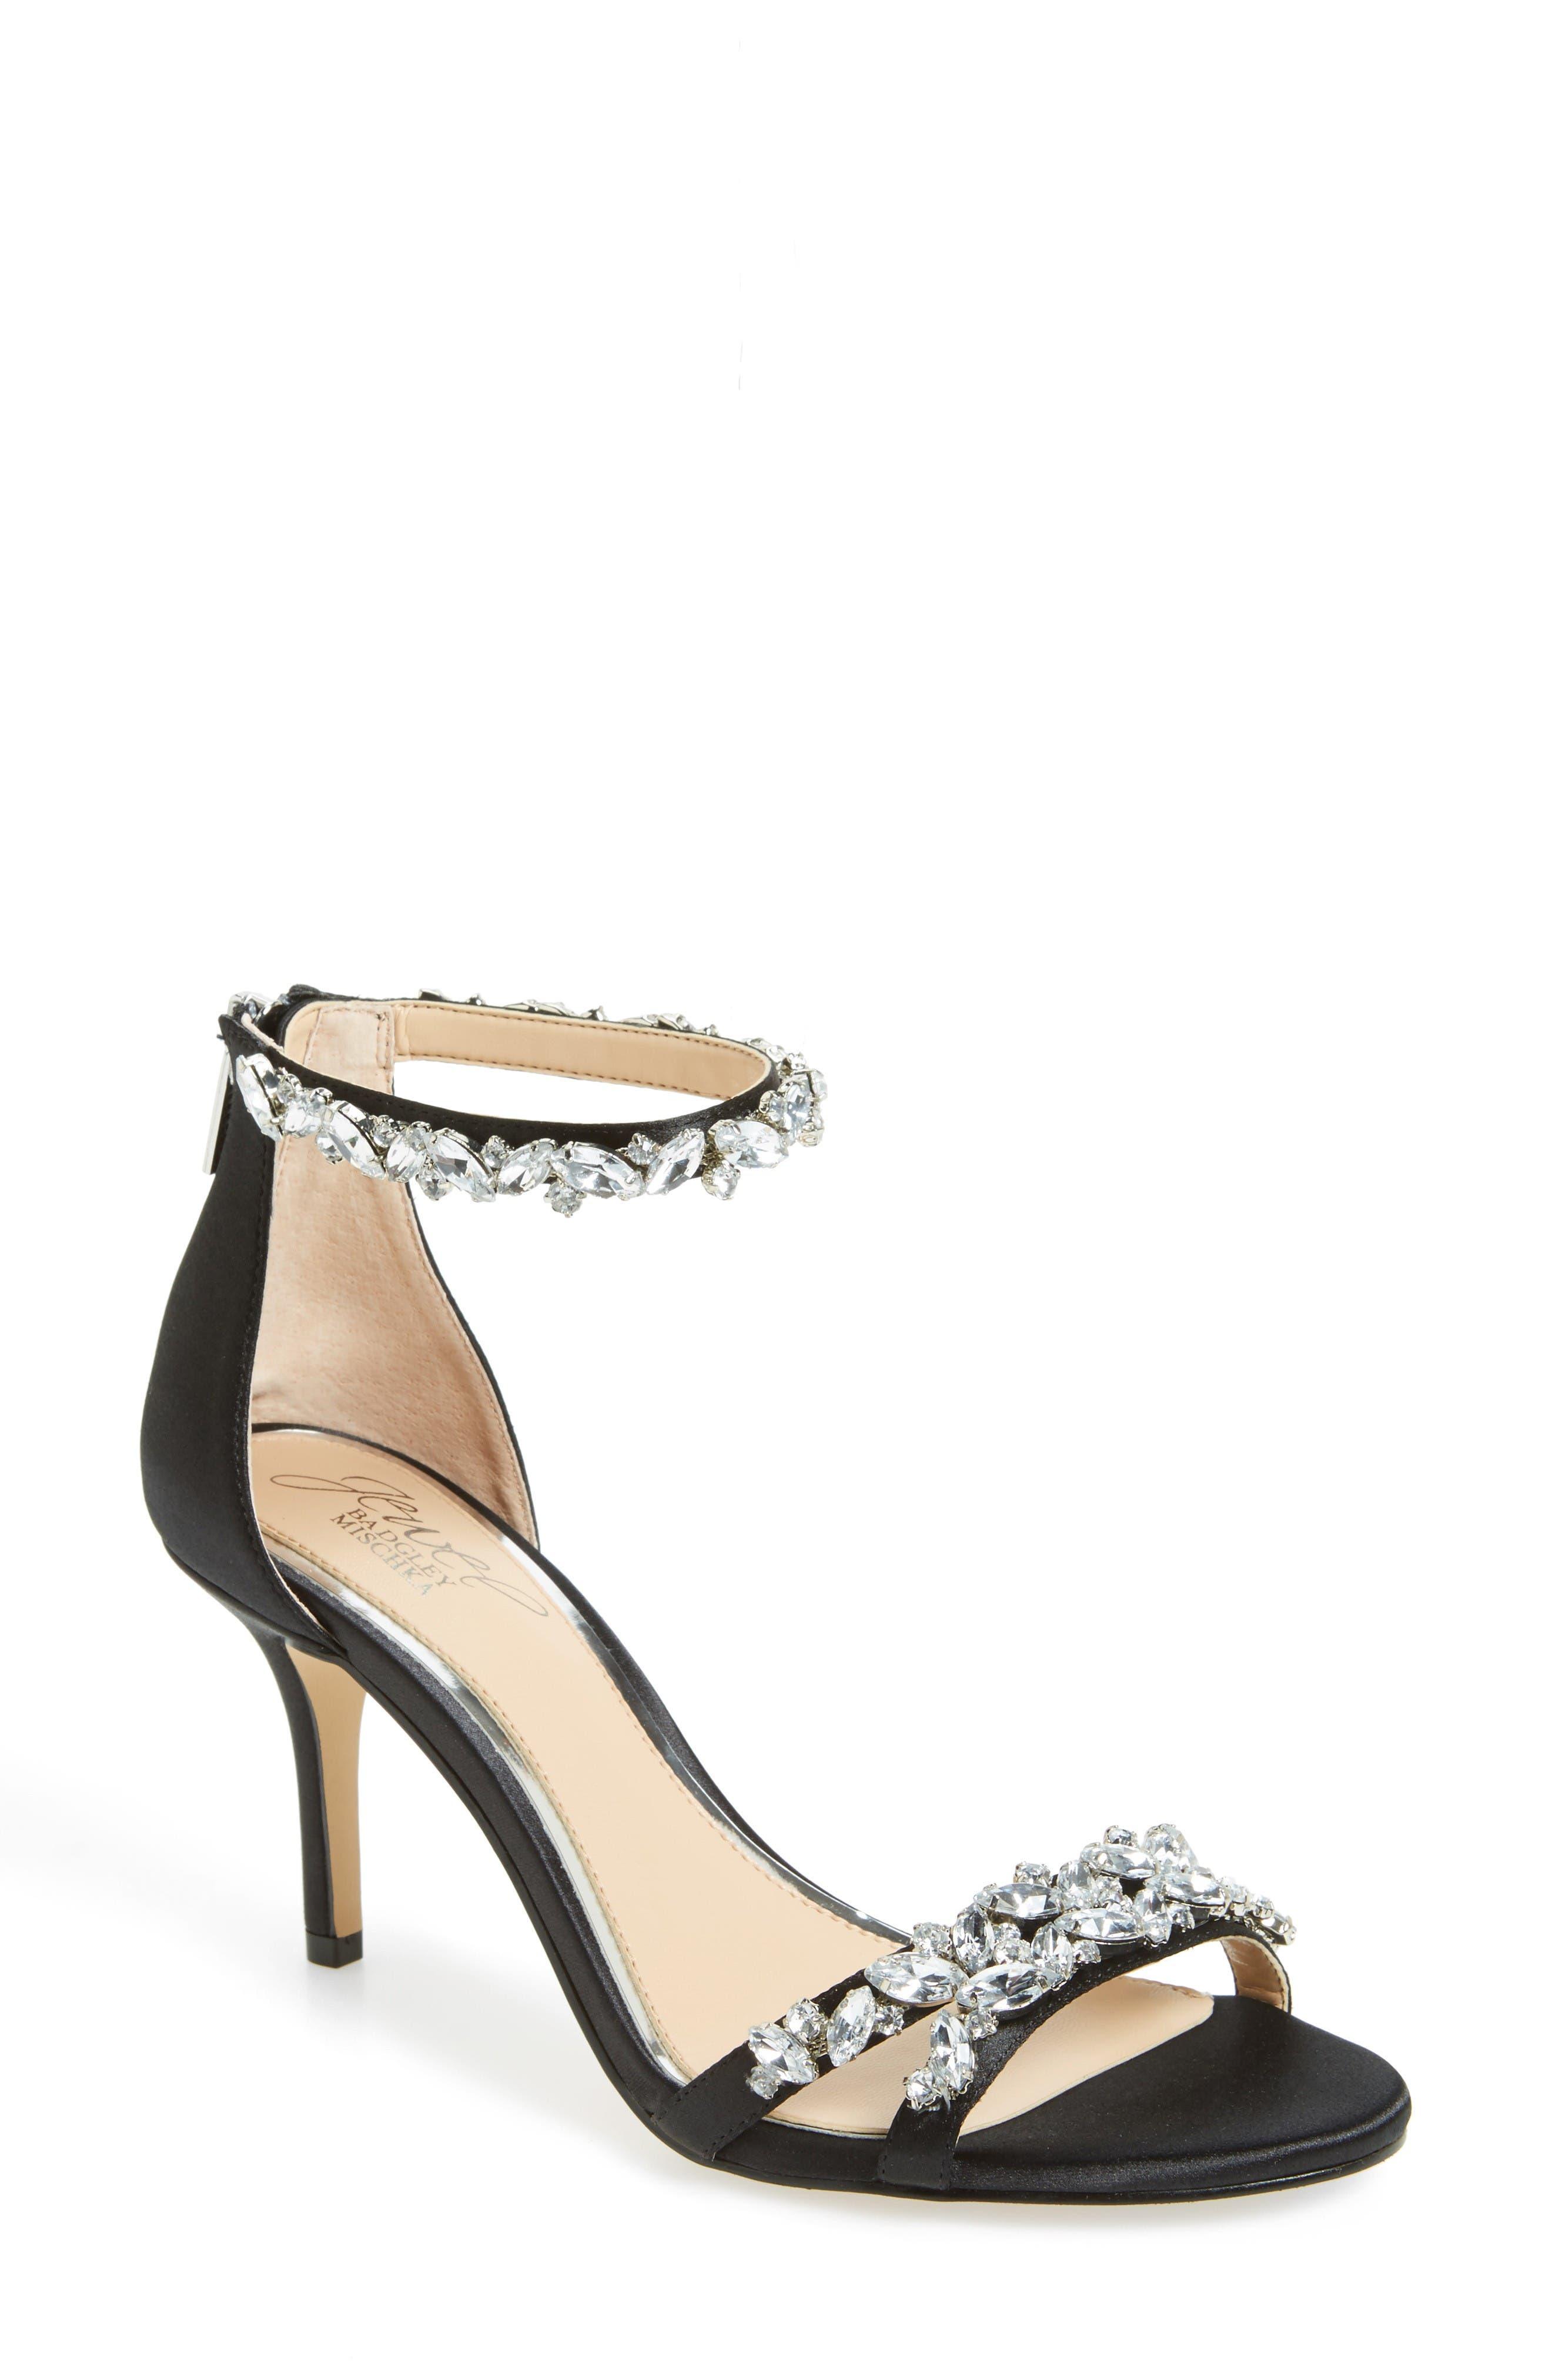 Main Image - Jewel Badgley Mischka Caroline Embellished Sandal (Women)